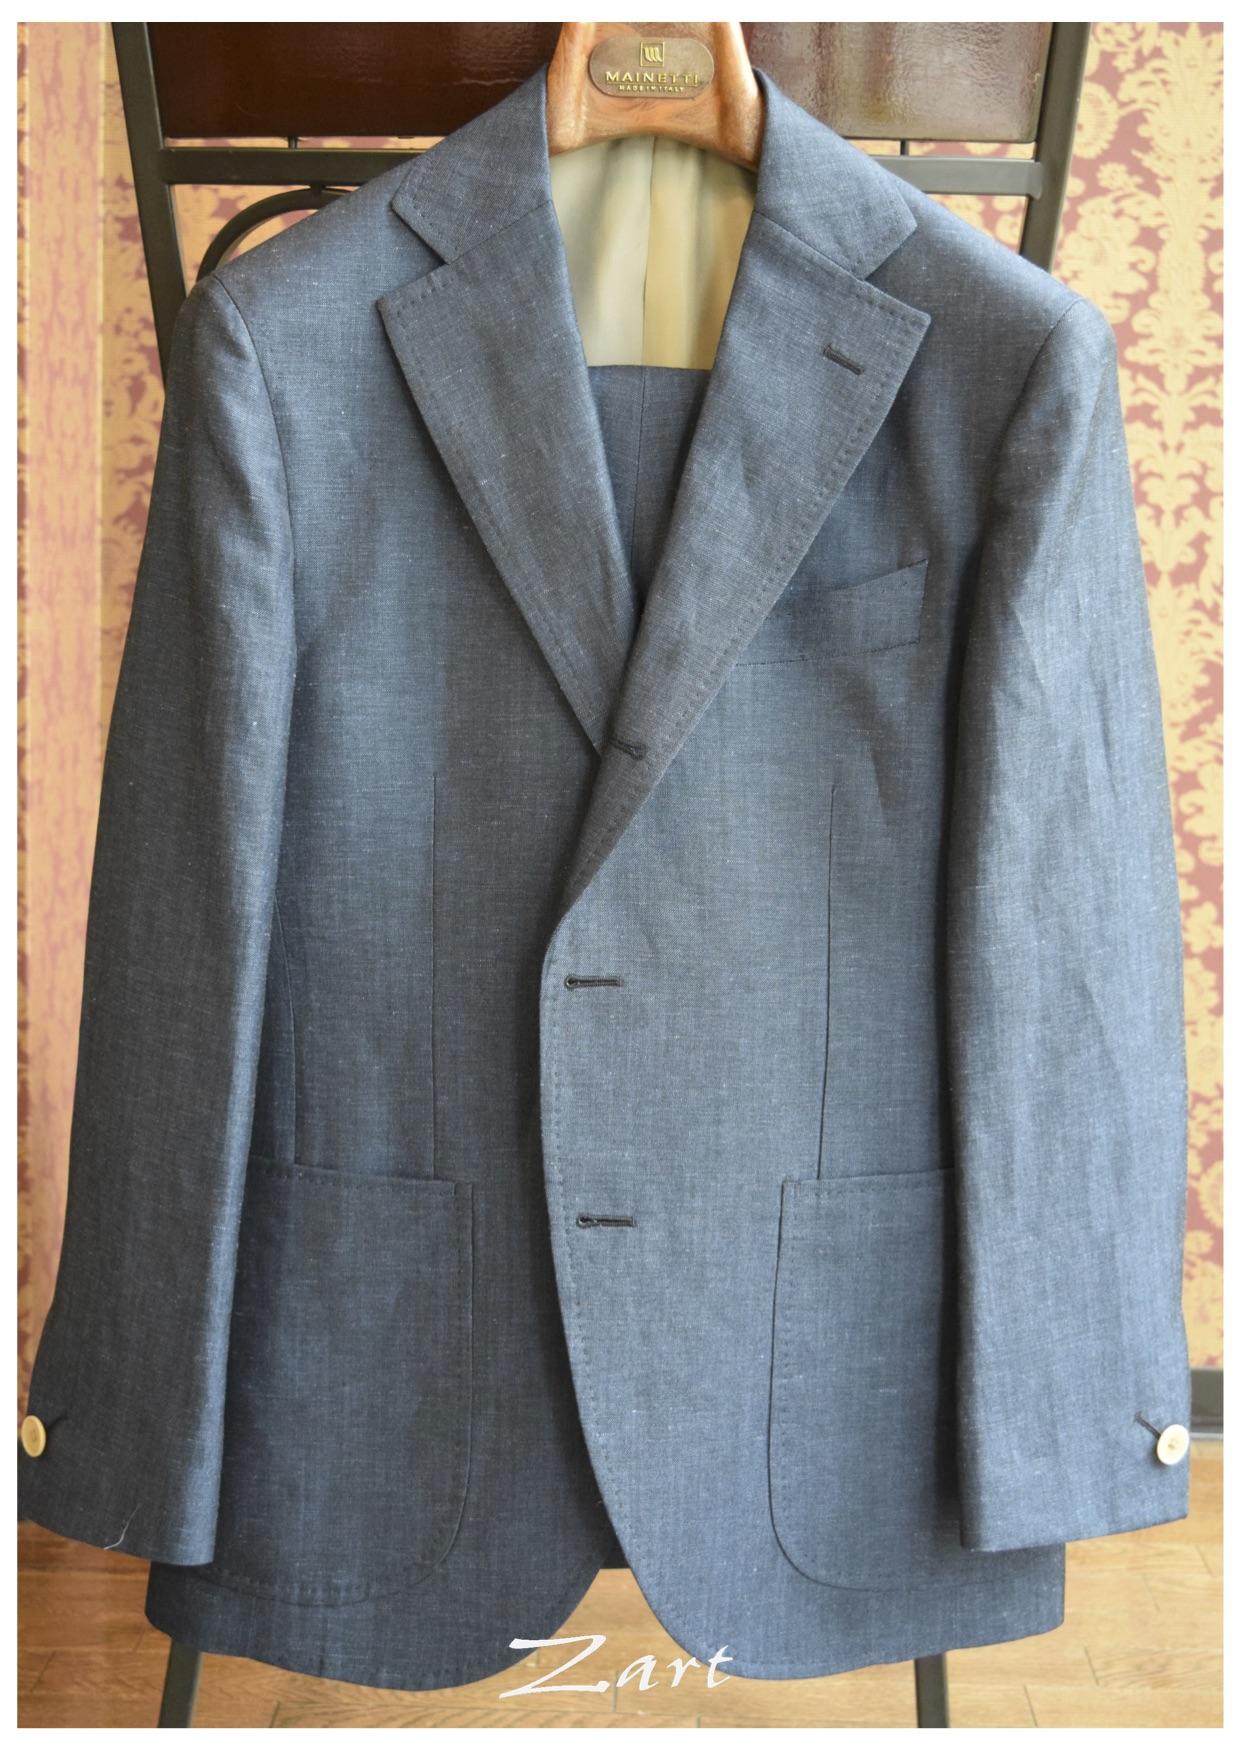 〜CANONICO Wool&Linen〜